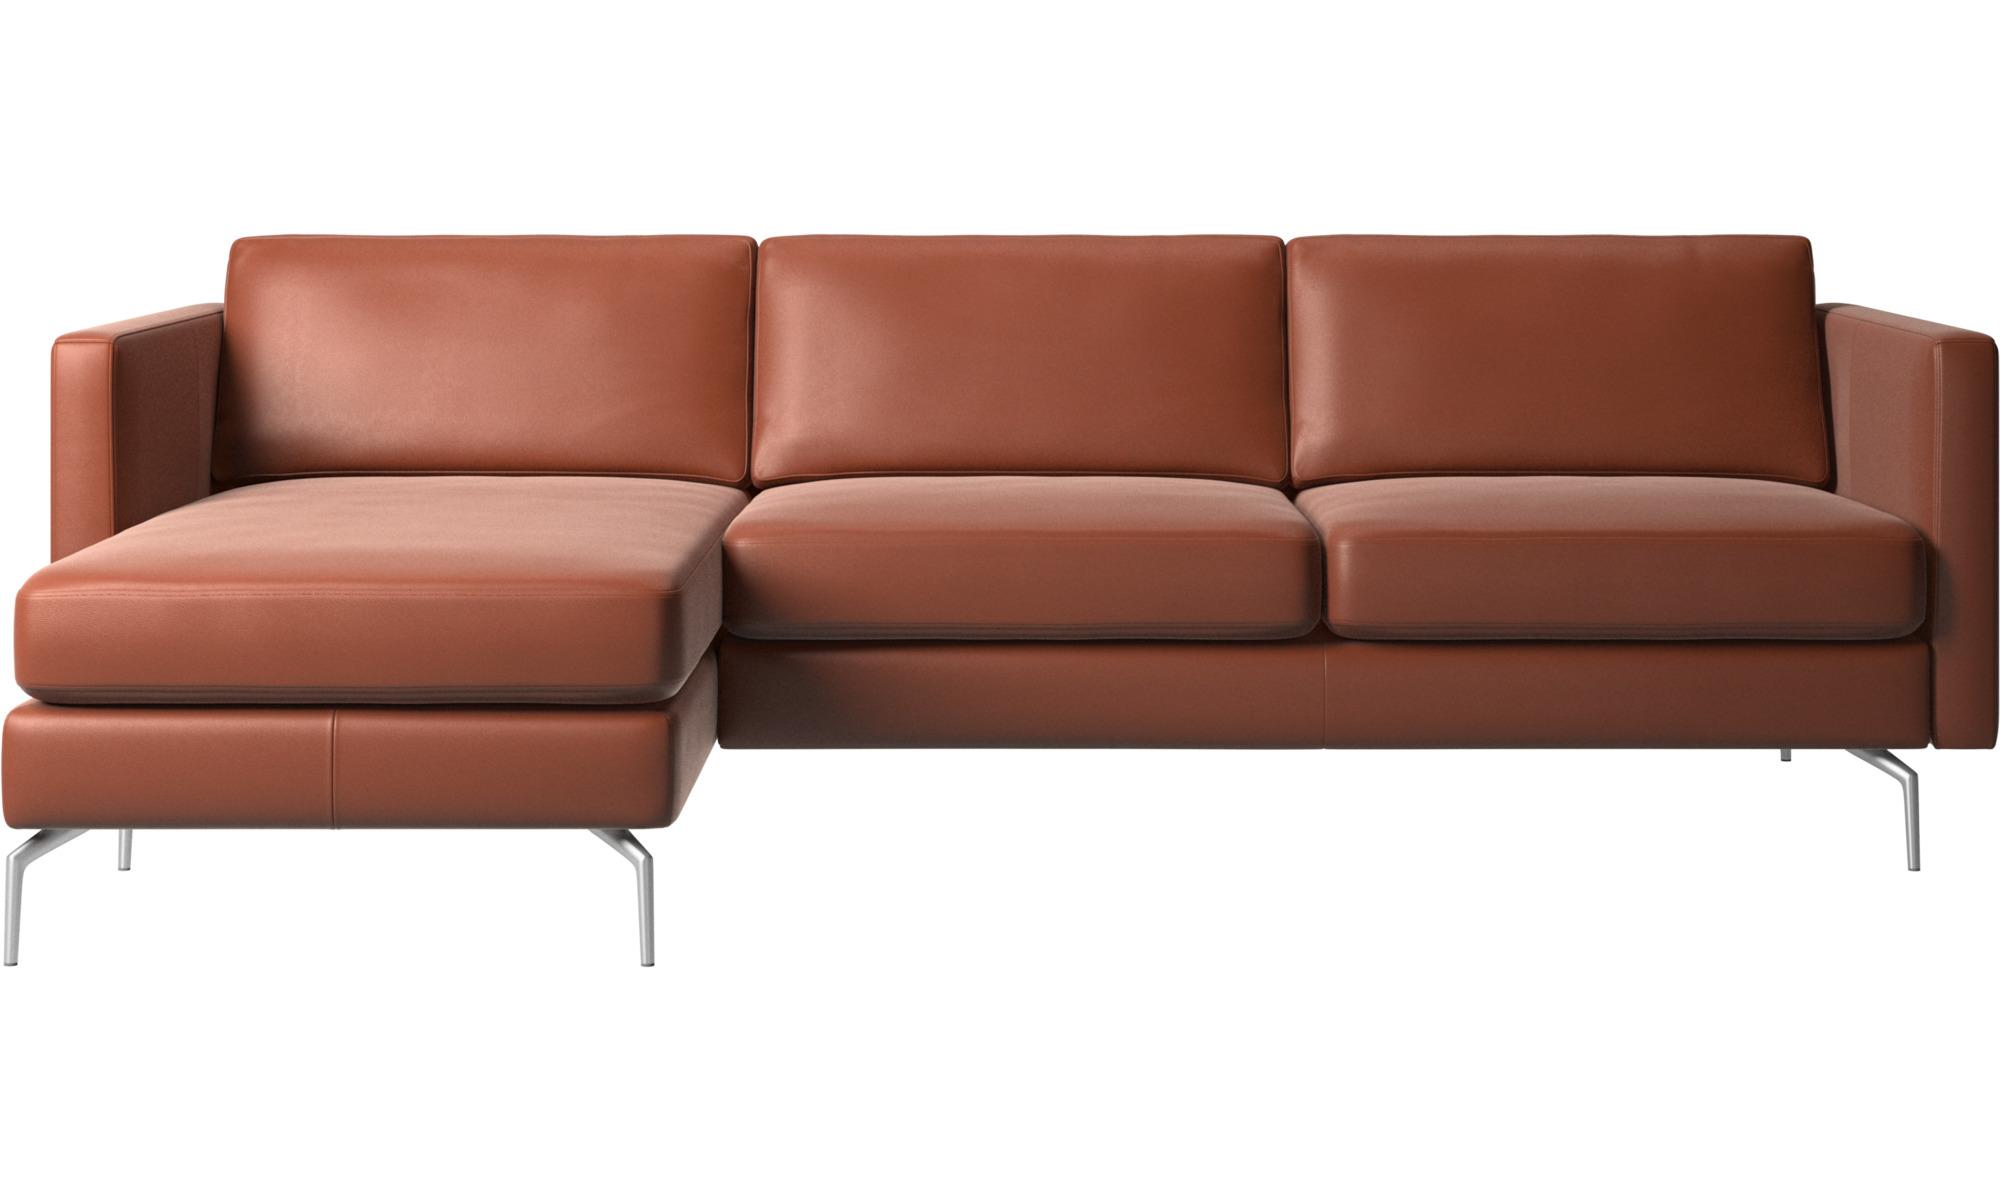 80b6855c4 Chaise longue sofas - Osaka divano con penisola relax, seduta liscia -  Marrone - Pelle ...